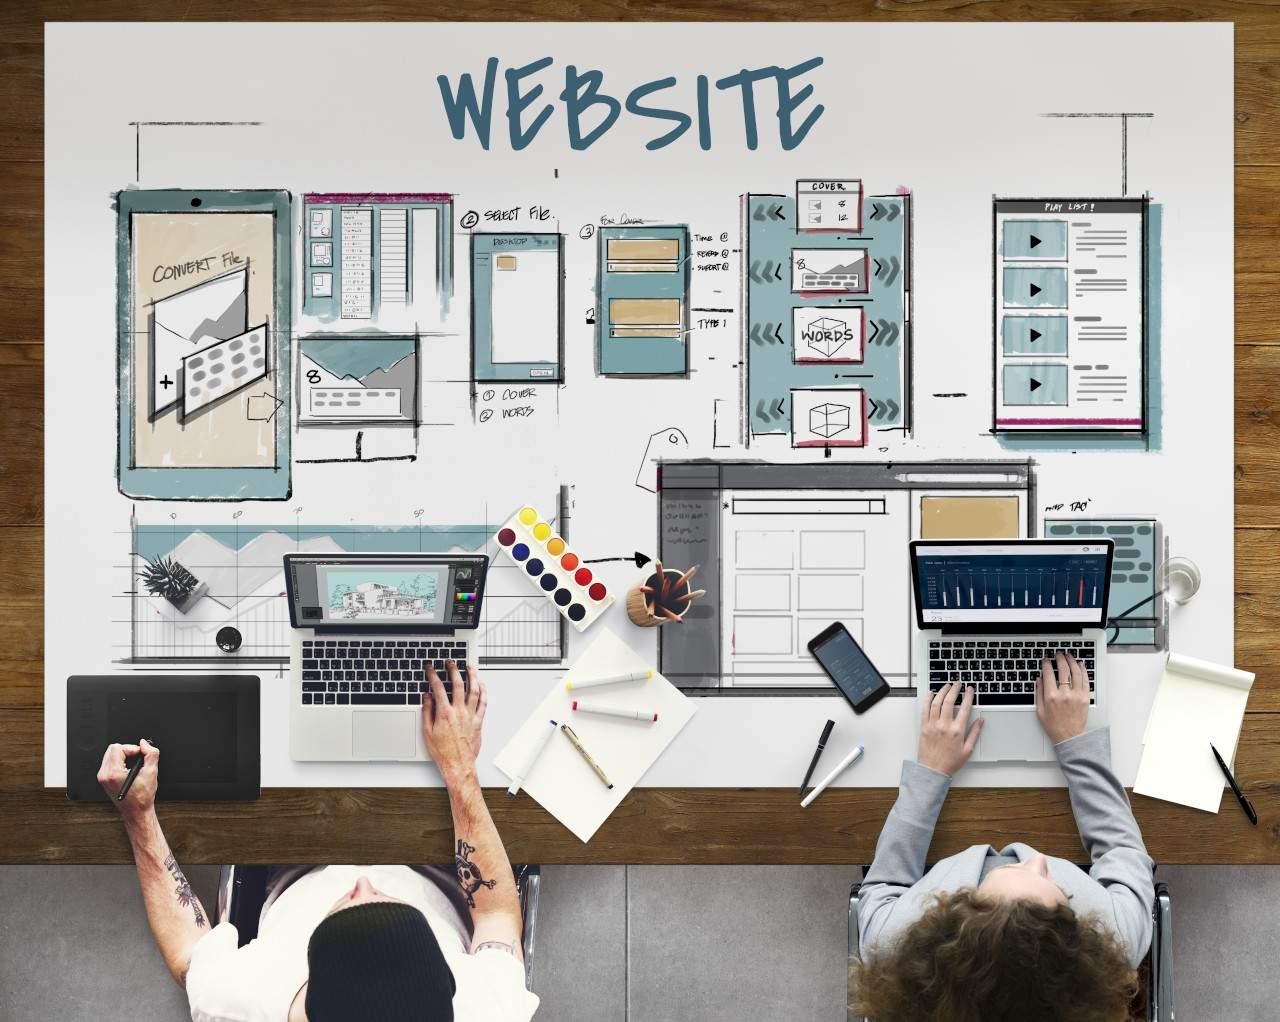 Web,template,layout,draft,sketch